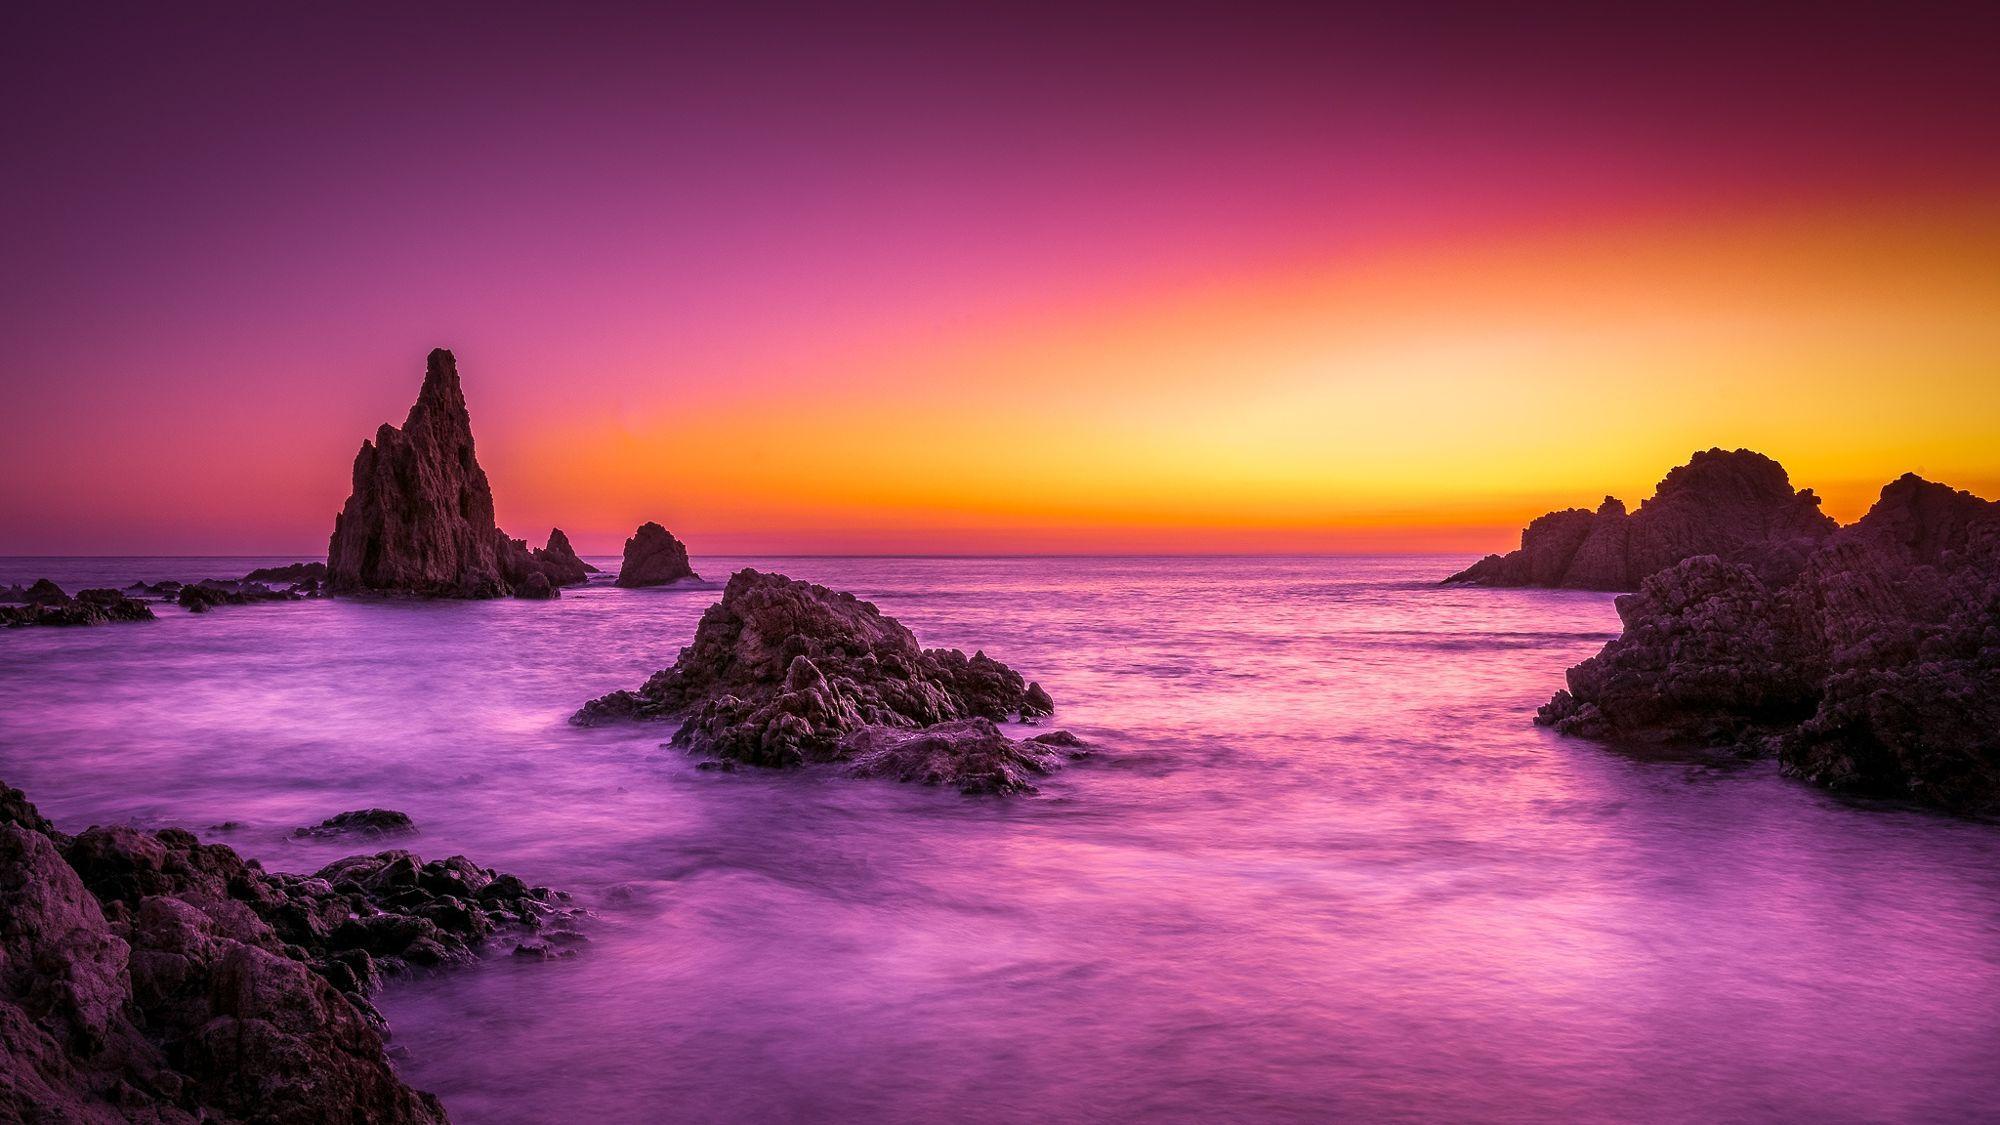 Arrecife de las Sirenas  Landscapes photo by JohnWright5 http://rarme.com/?F9gZi